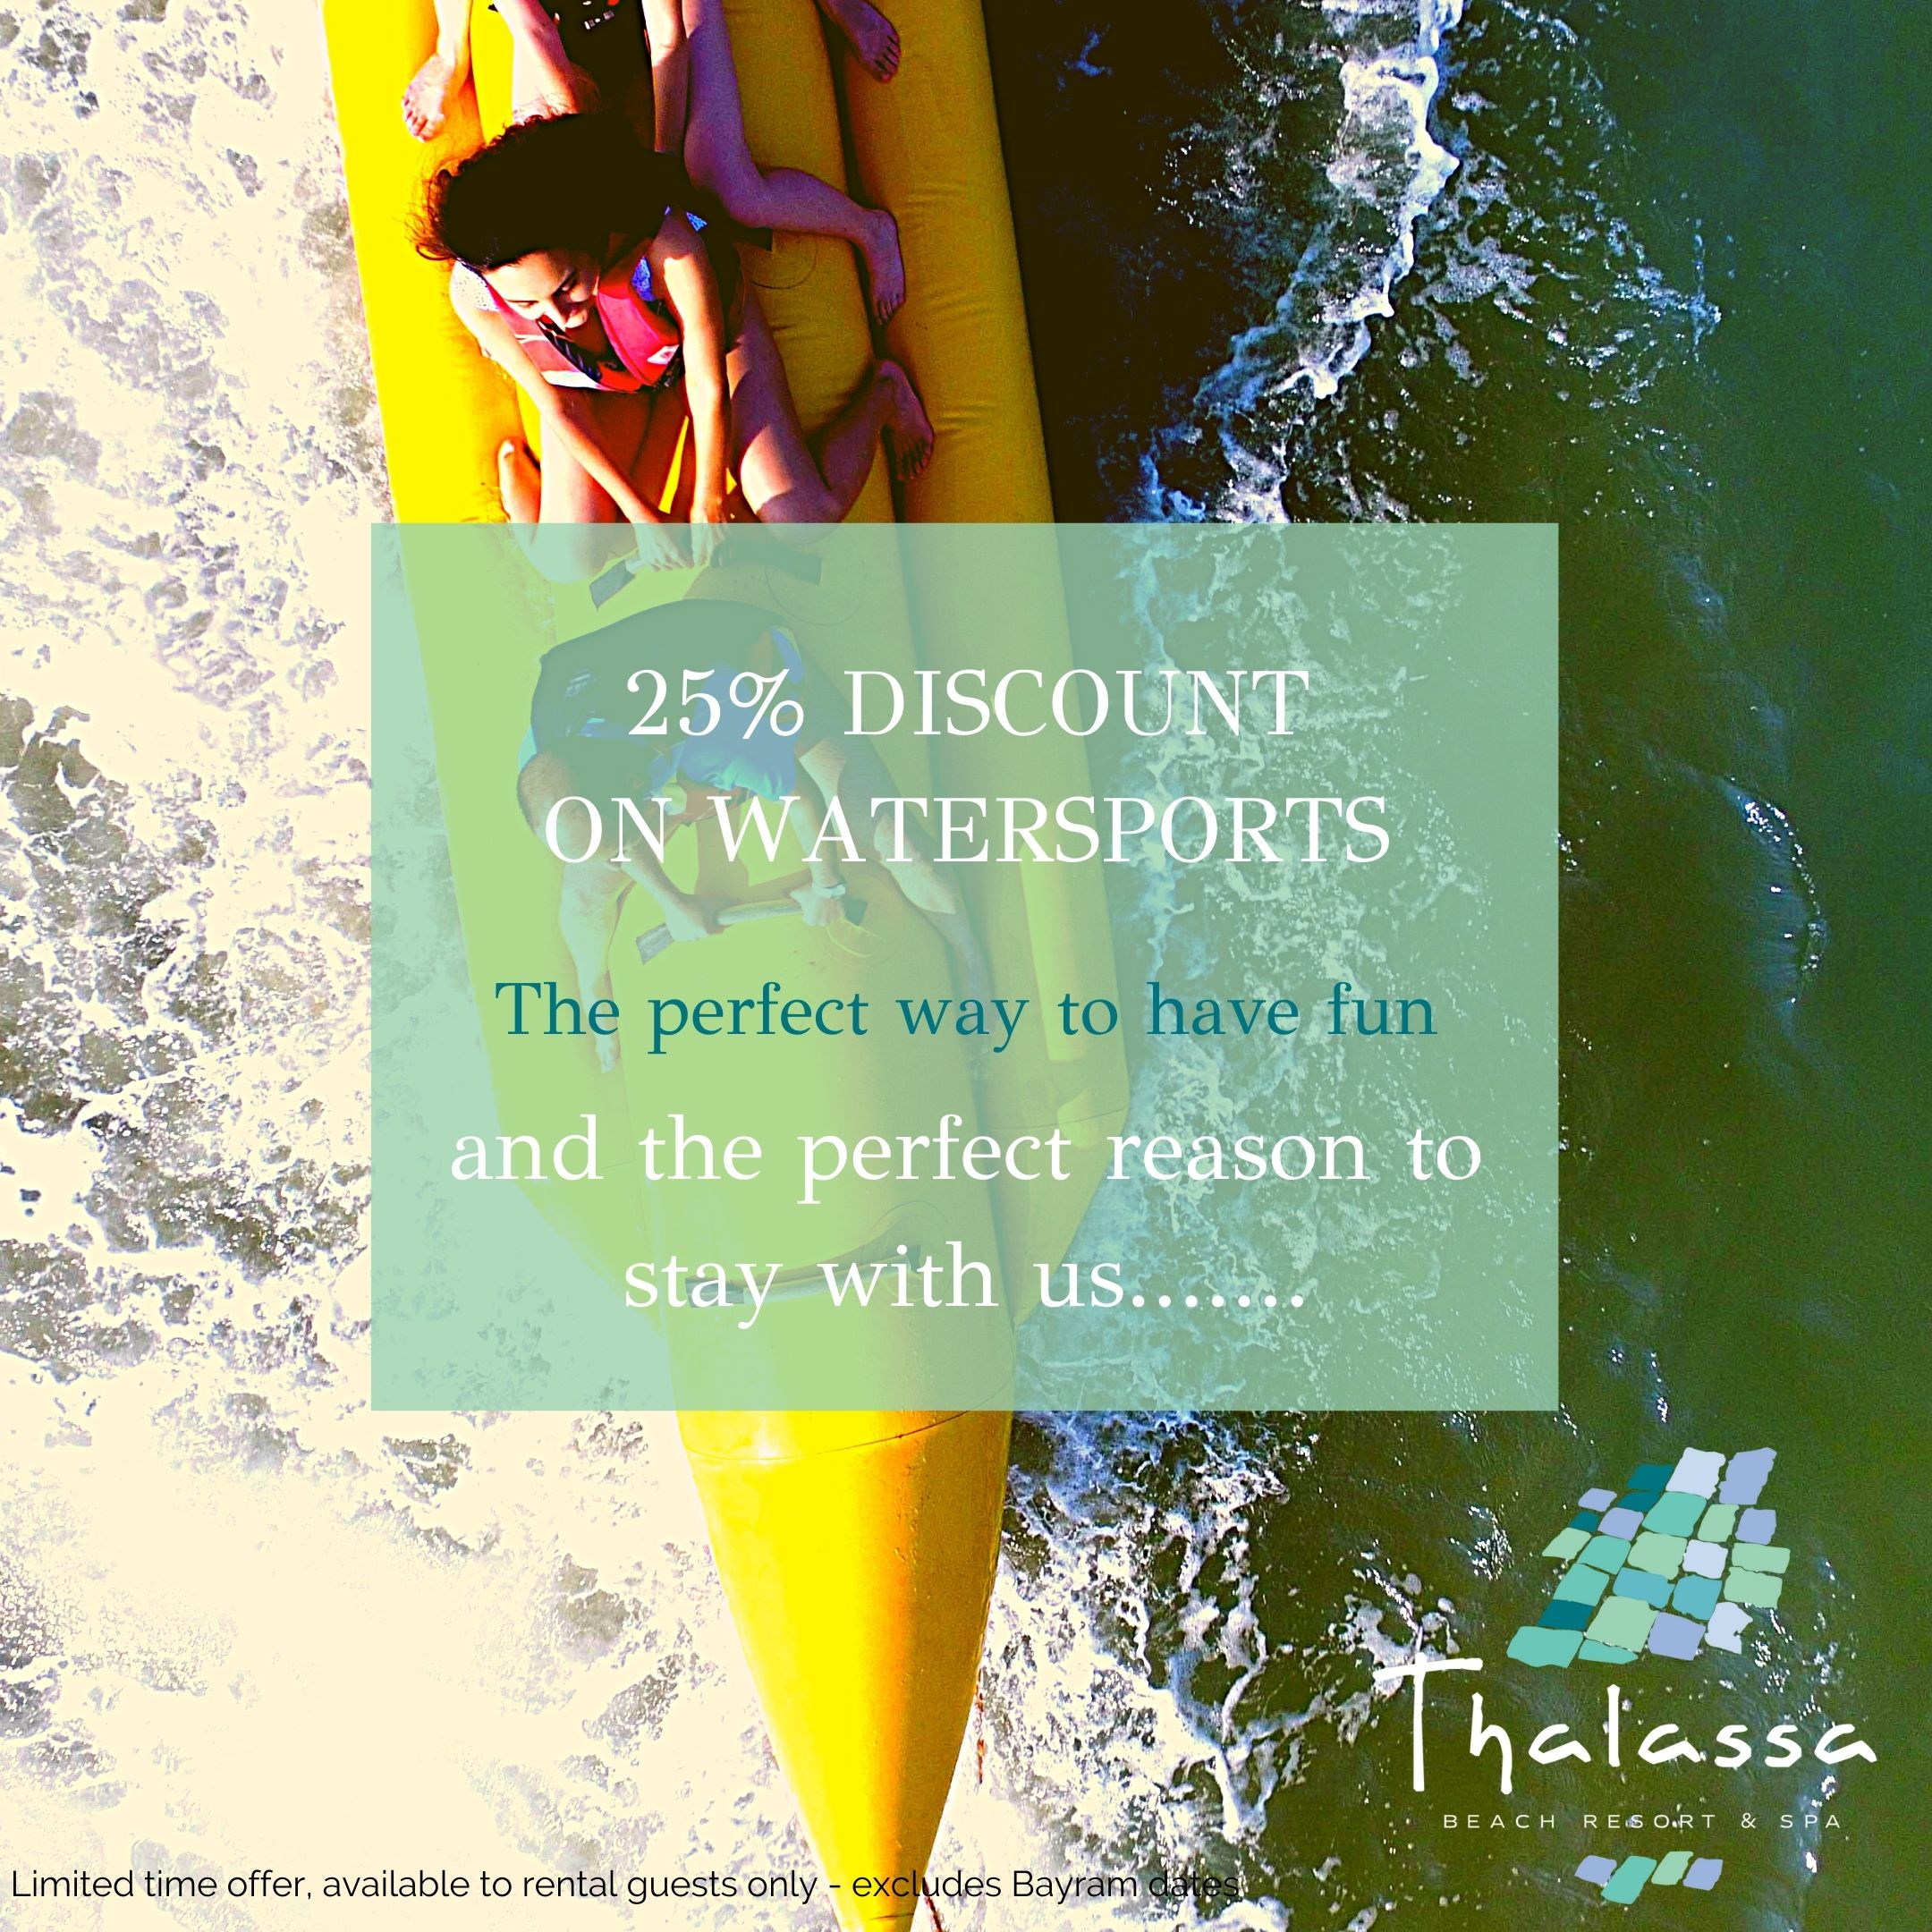 thalassa watersports discount